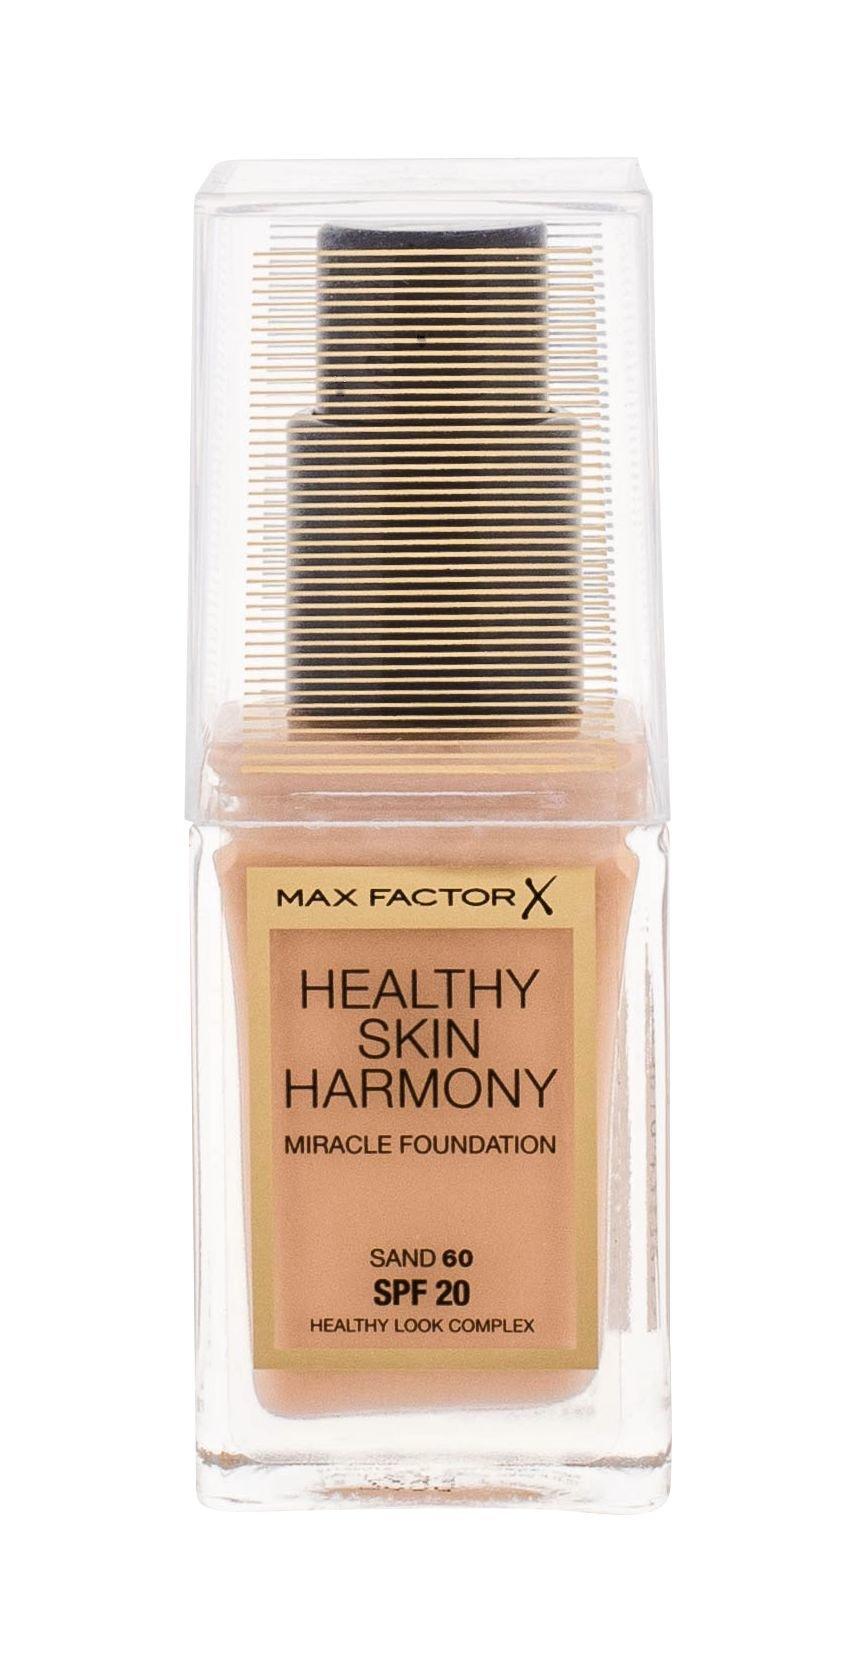 Max Factor Healthy Skin Harmony Makeup 30ml 60 Sand